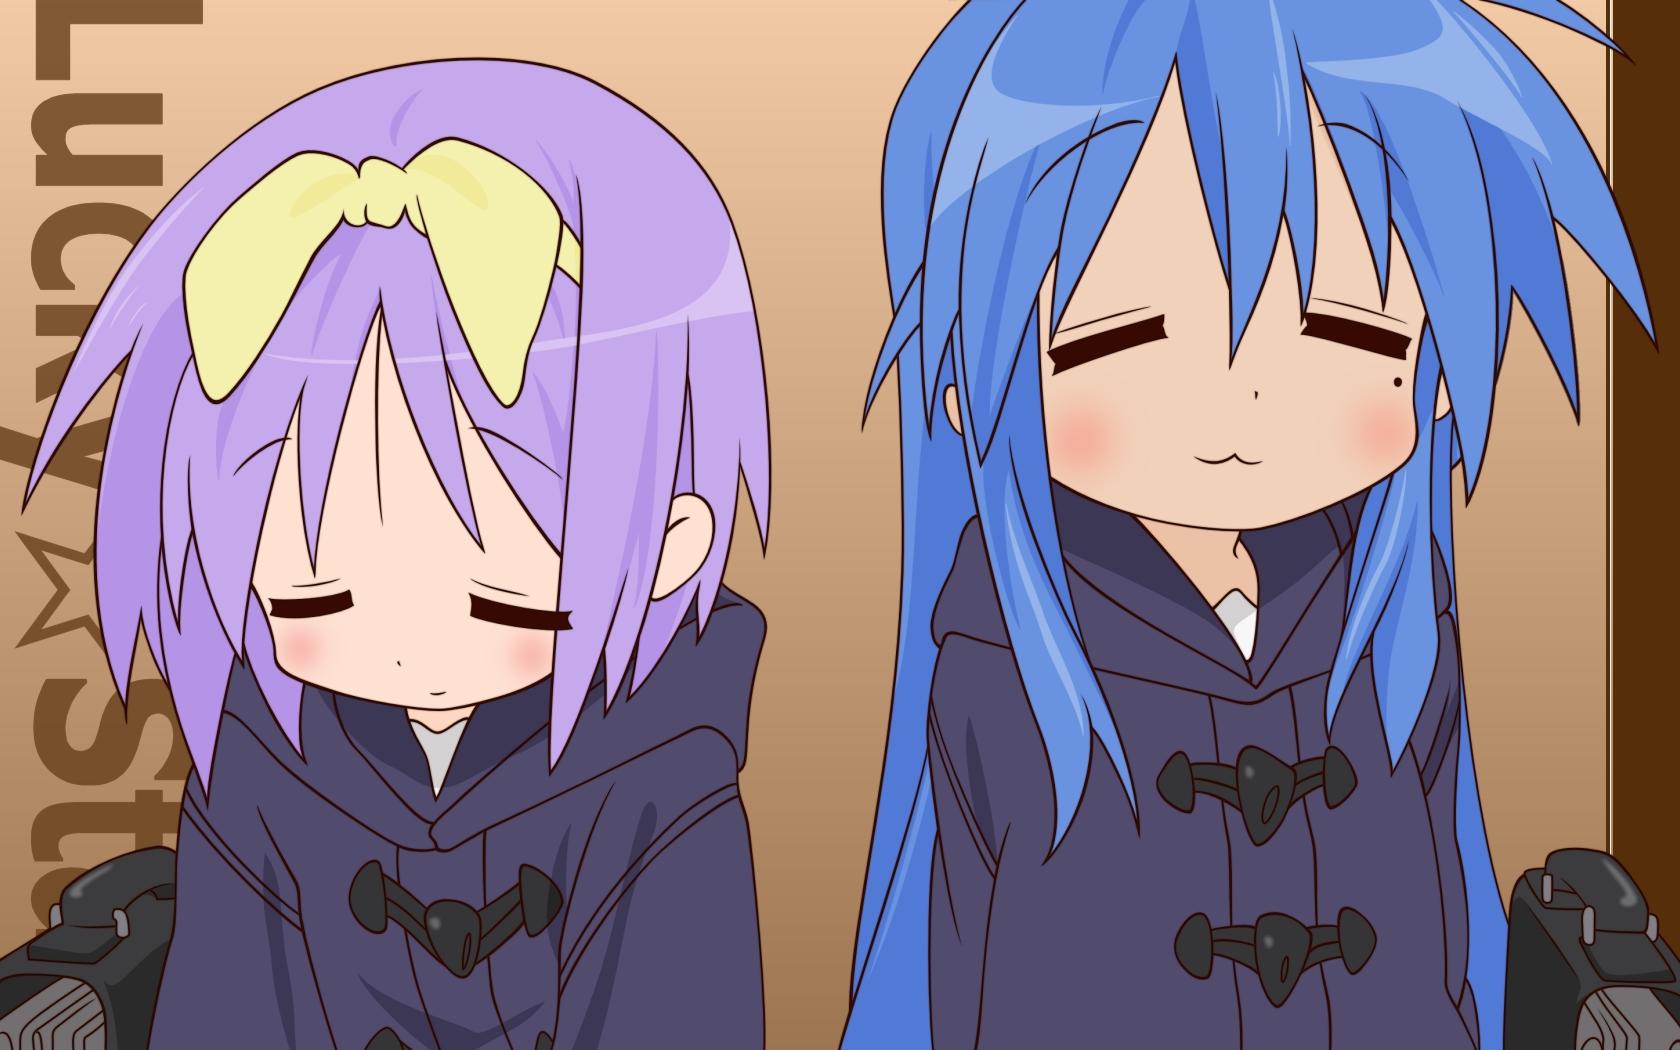 Illustration Anime Emotion Lucky Star Izumi Konata Hiiragi Tsukasa Girls Mangaka